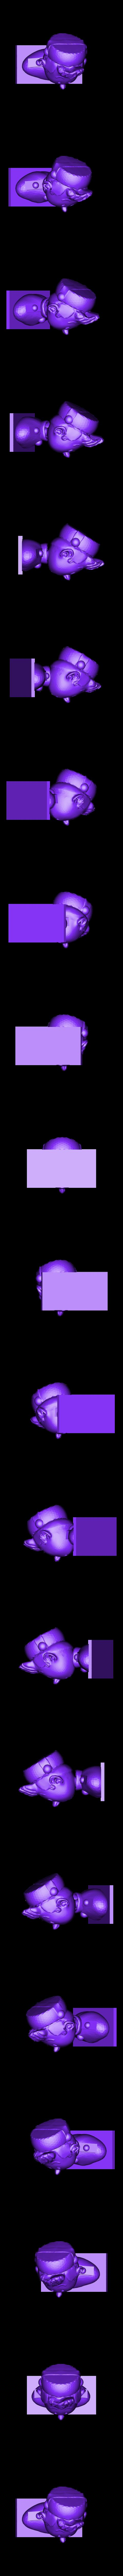 spirou.obj Download free OBJ file Bust of Spirou • 3D printable template, MisterDiD